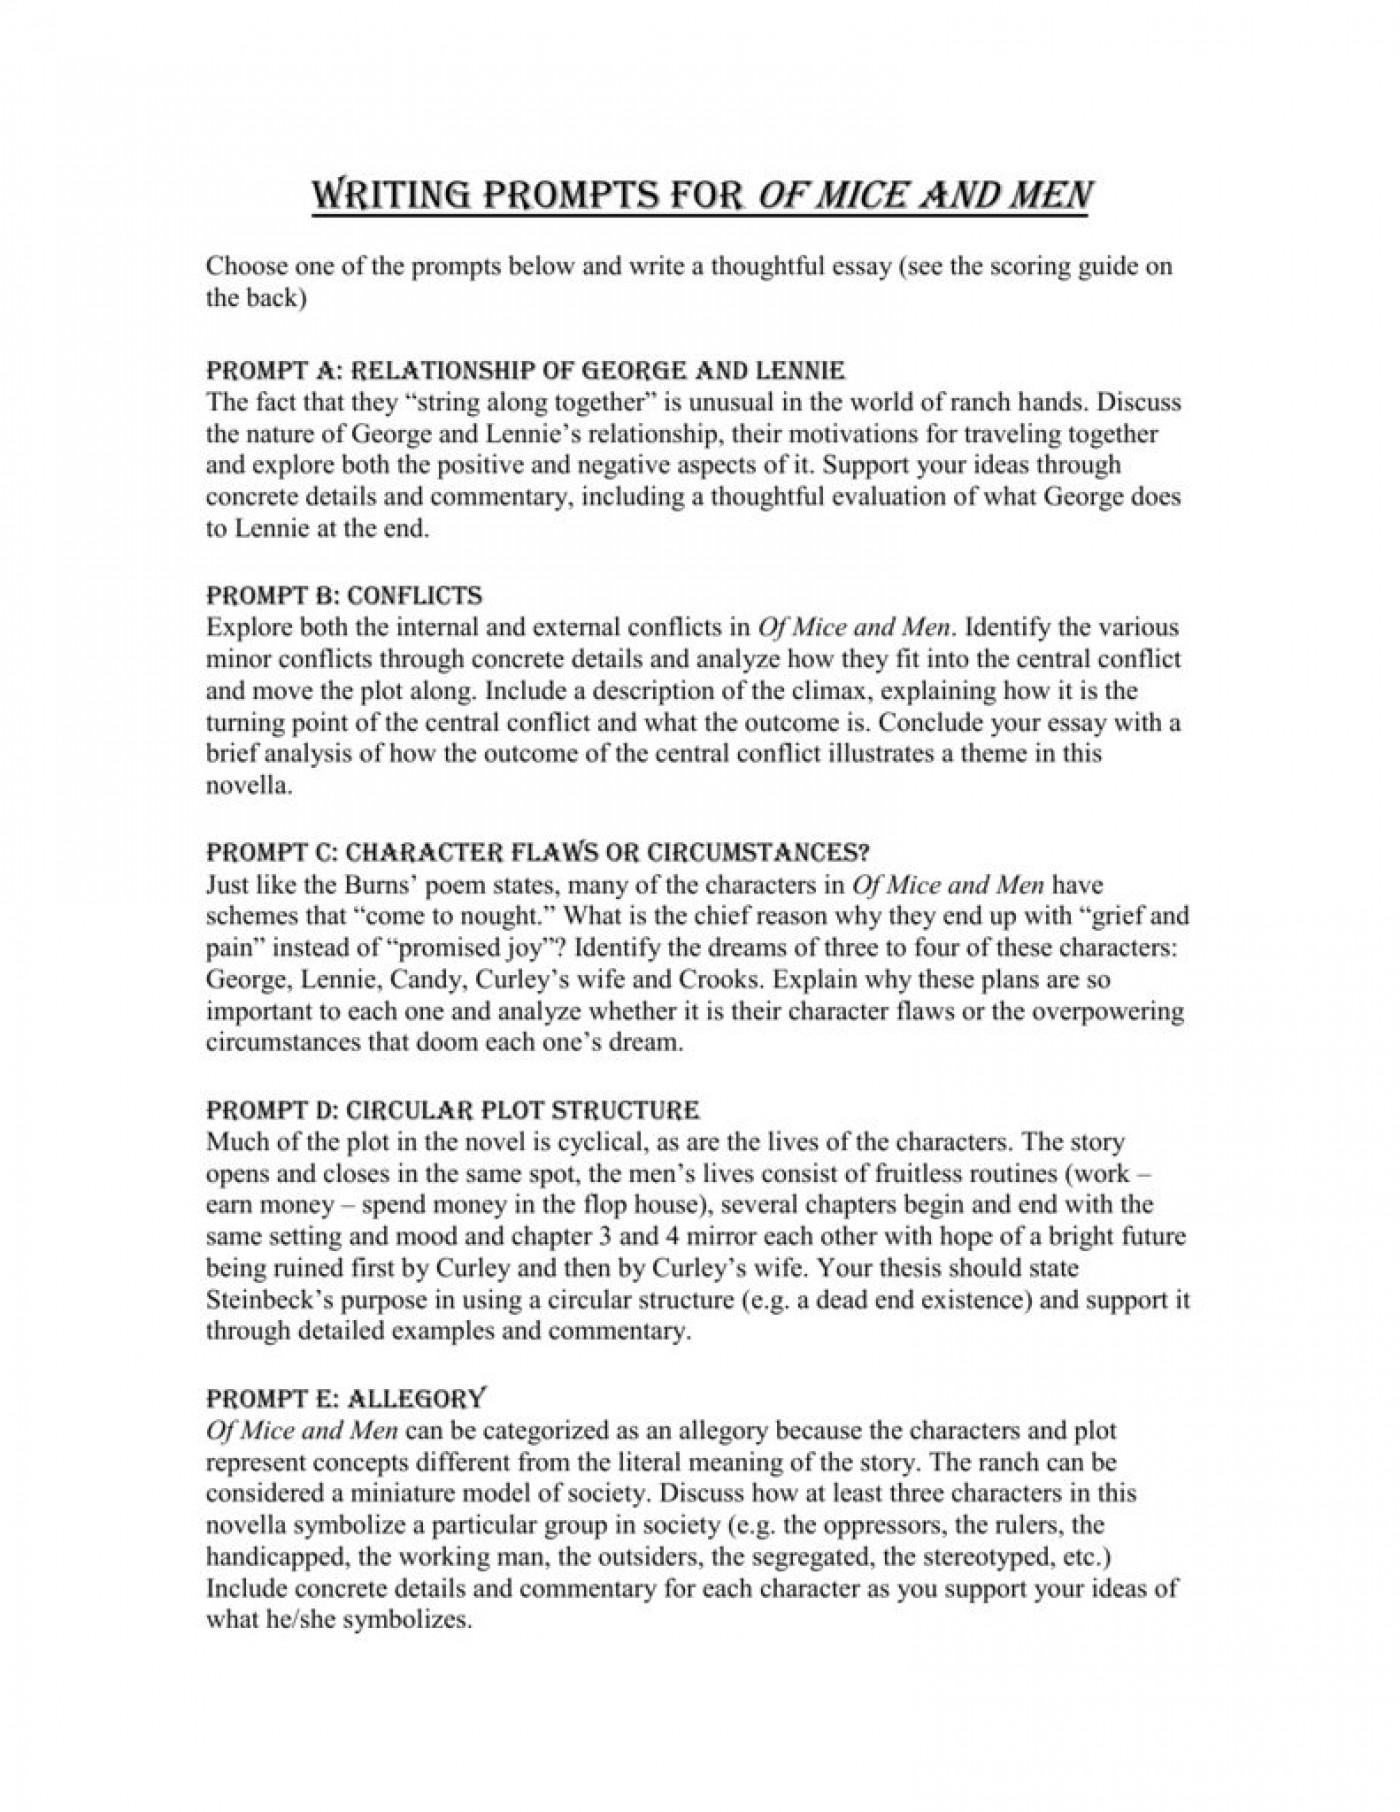 005 Unique Of Mice And Men Essay Image  Prompt Topic1400